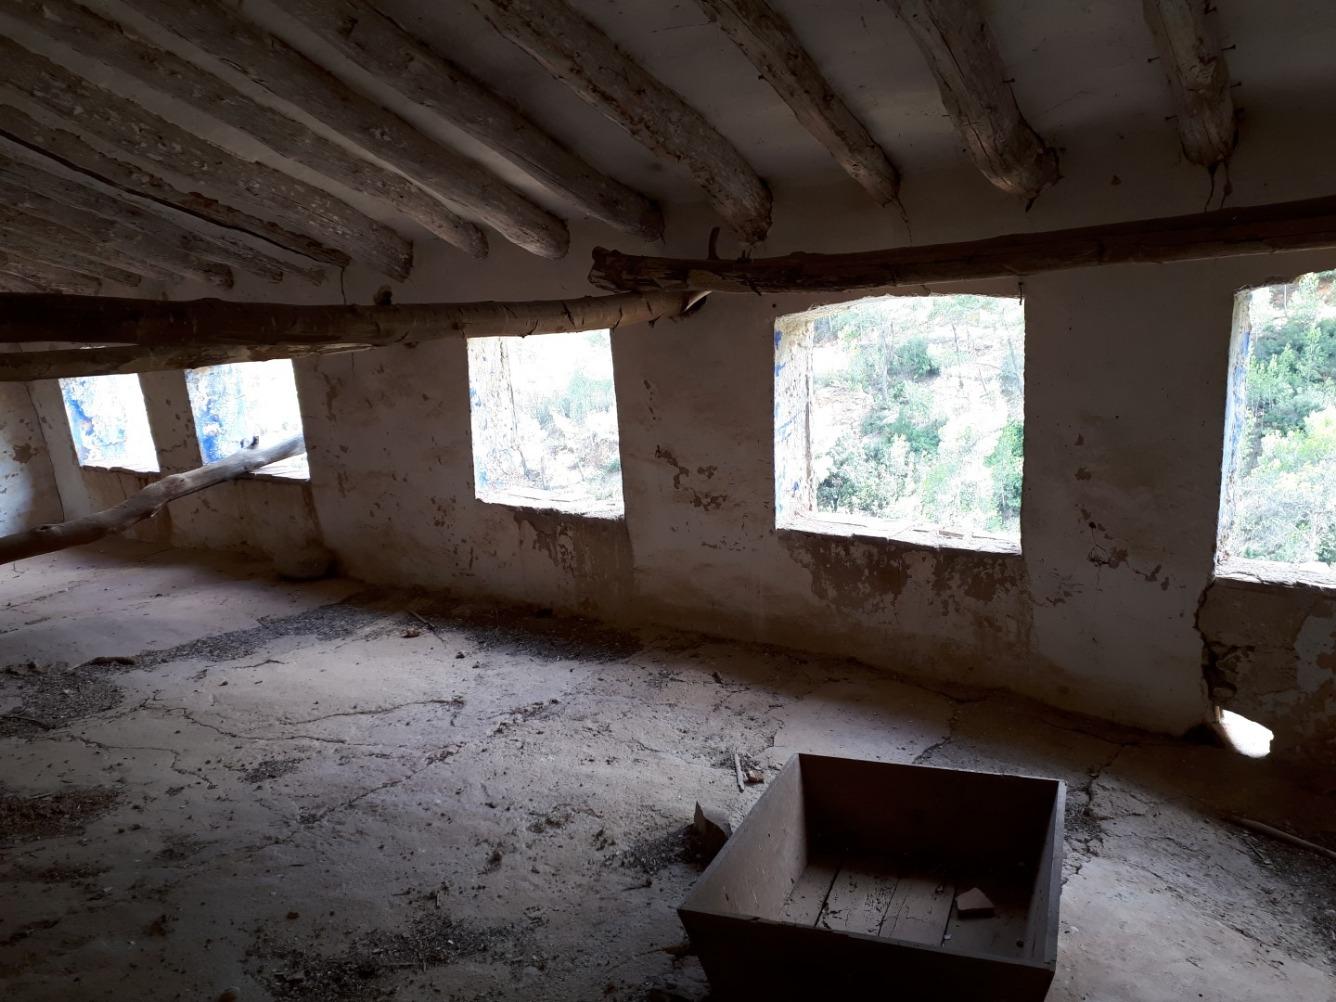 Casa  L'alcalatén - lucena del cid. Grandiosa masia solitaria para reformar con encanto